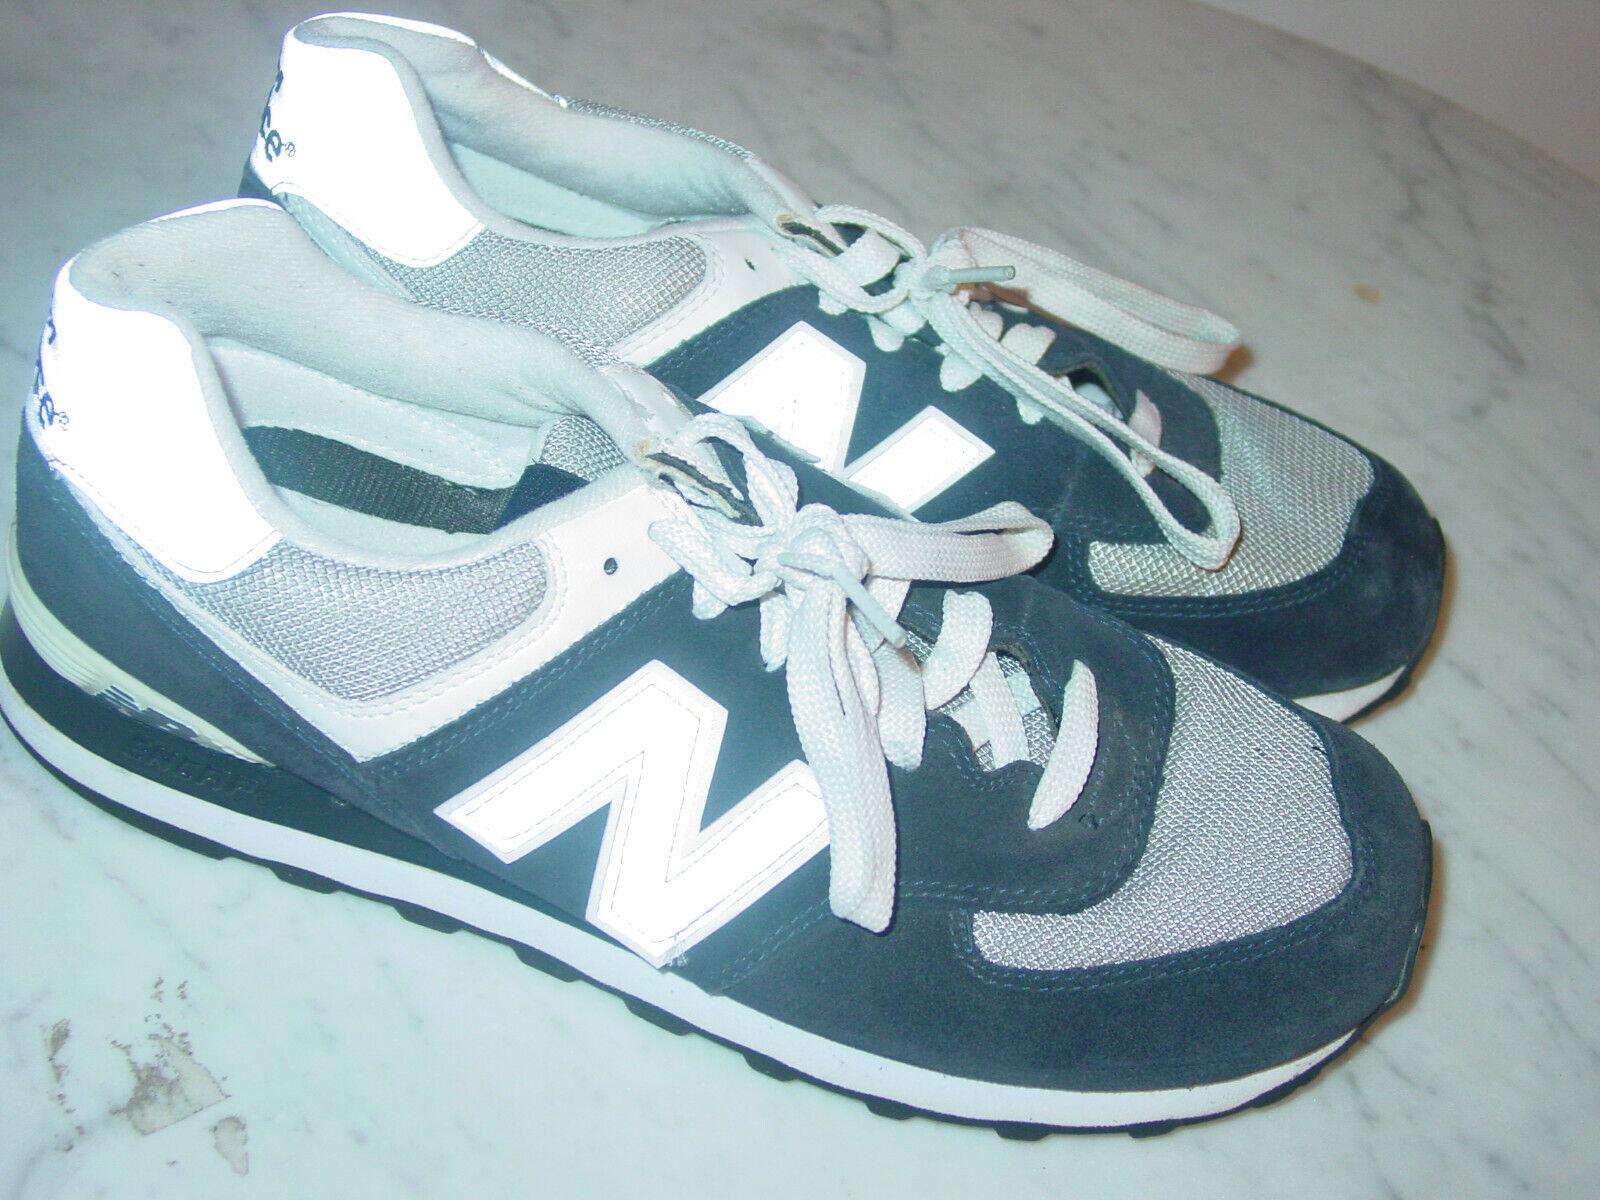 Mens New Balance 574  M574BGS  Navy Light Grey White Running shoes  Size 9.5